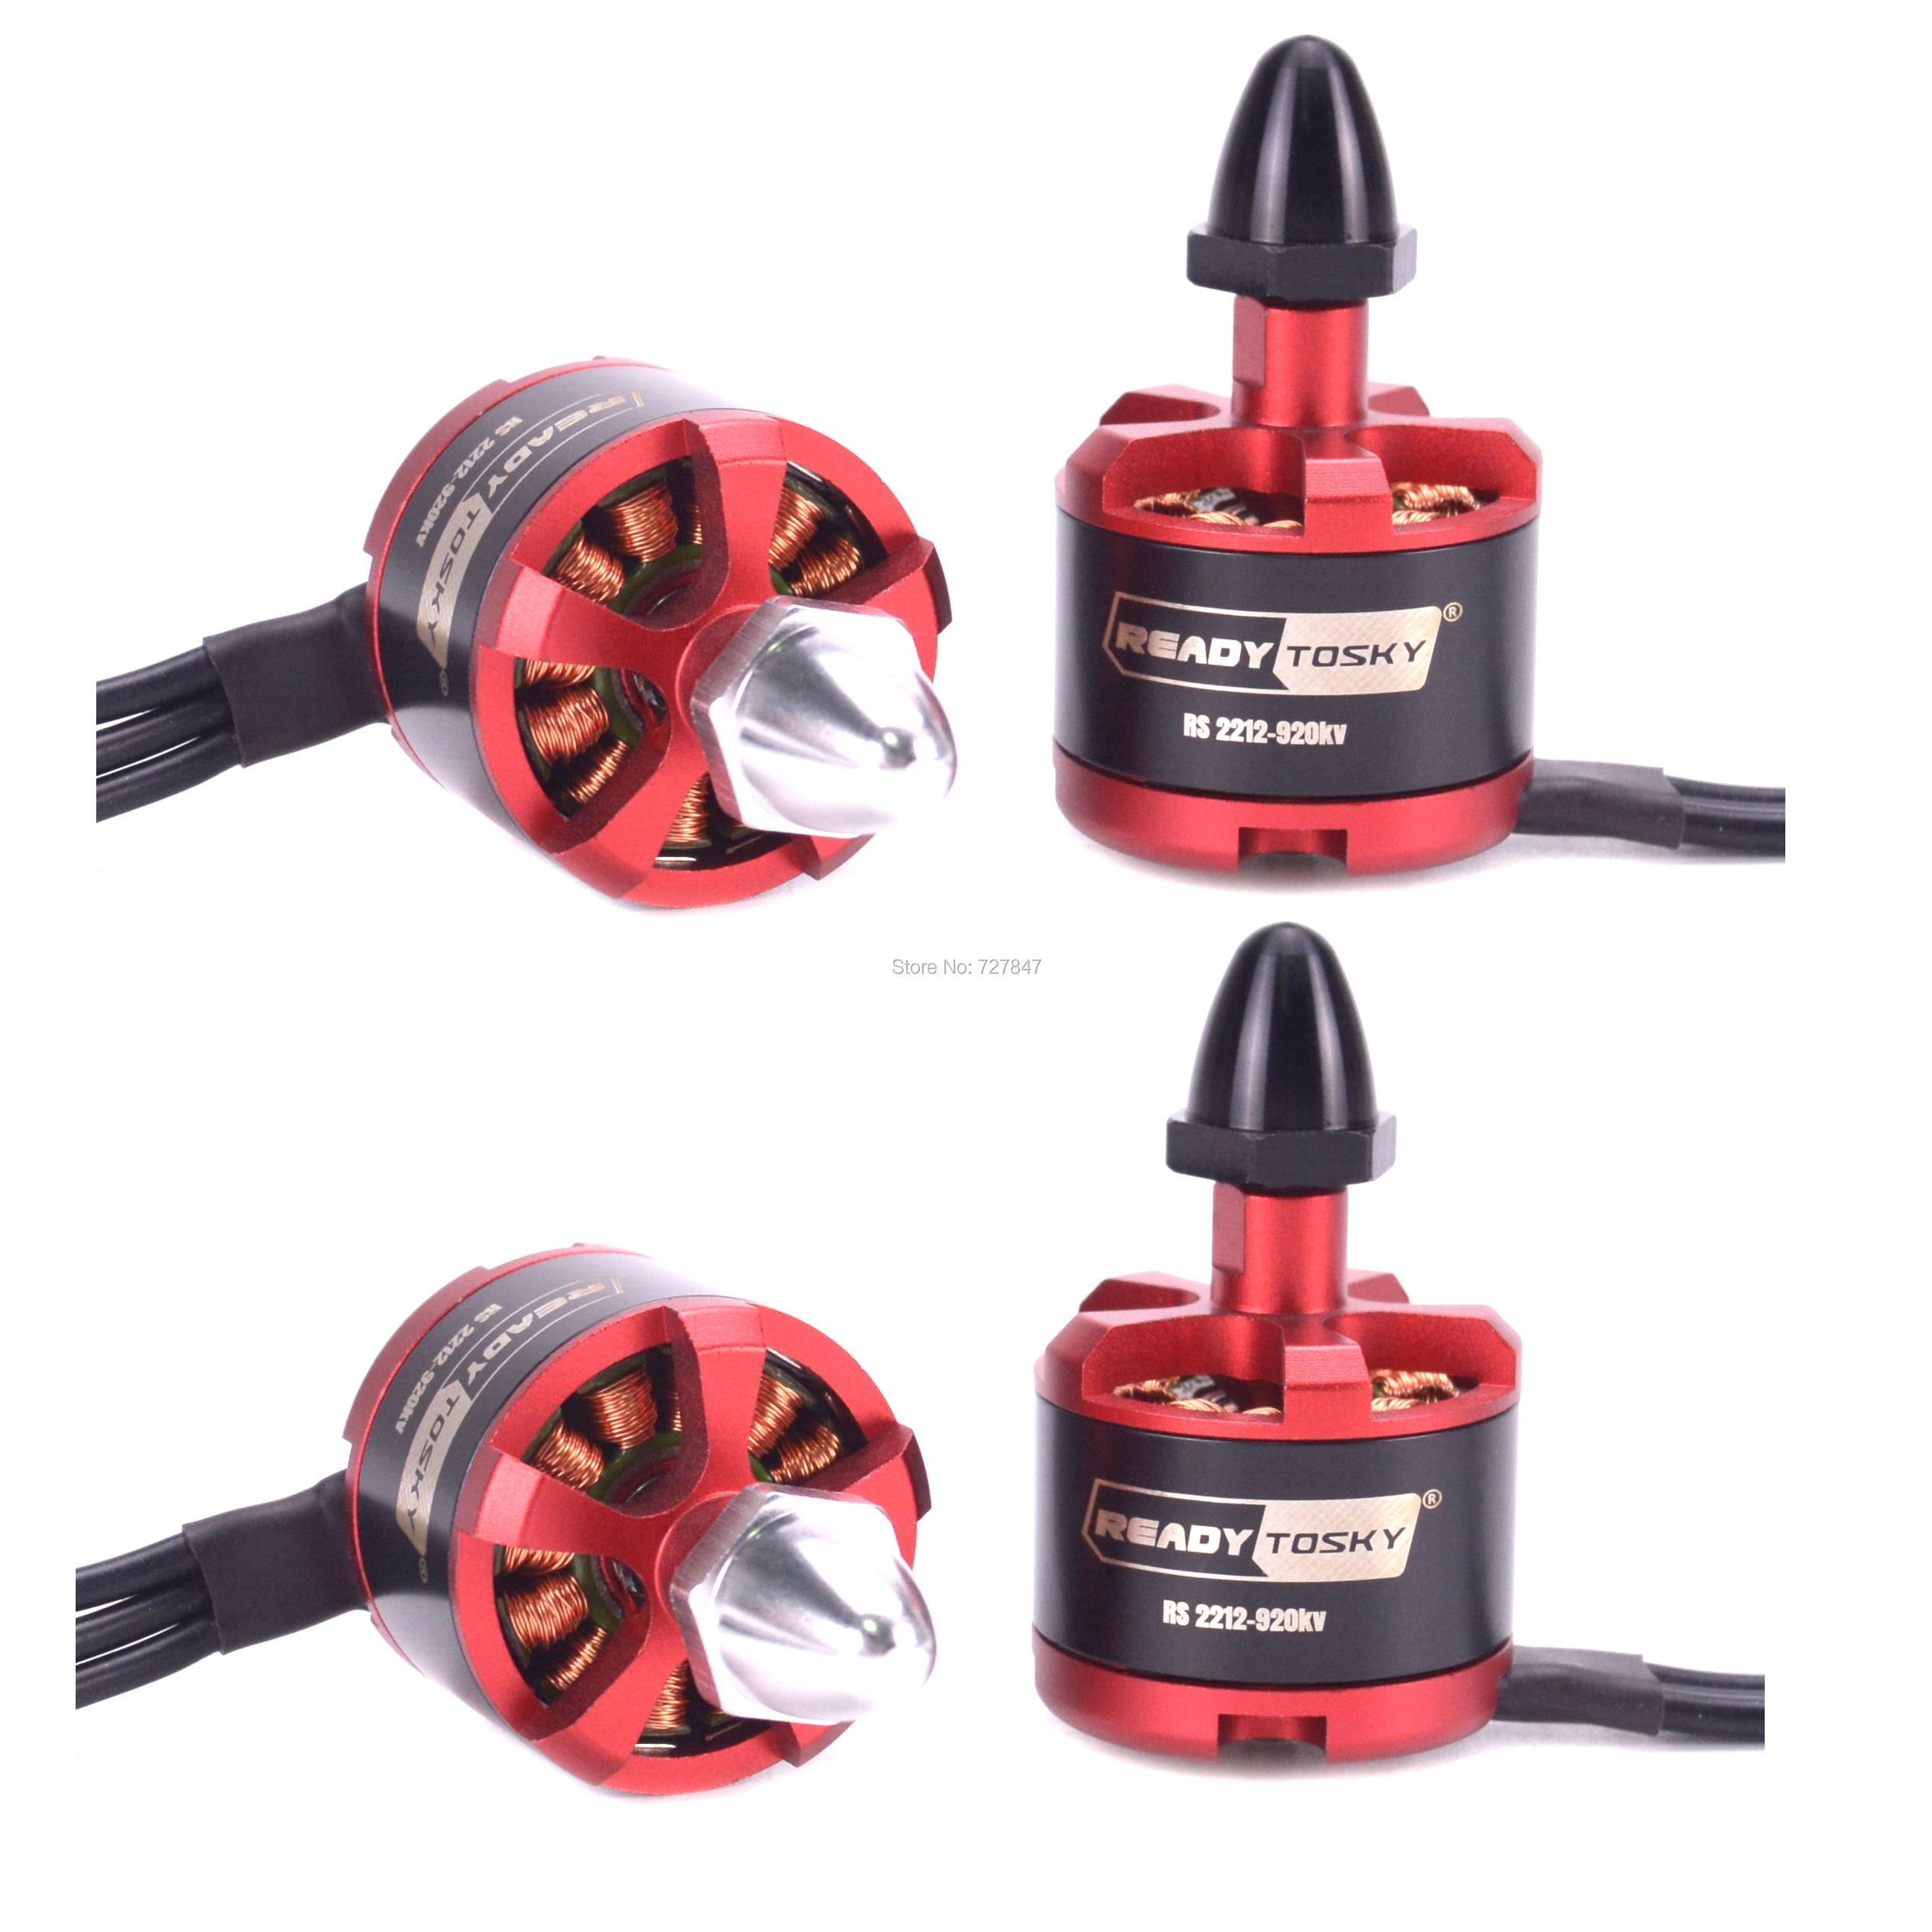 NOVO 2212 CW CCW Do Motor Brushless para F330 920KV X525 F450 S500 500 550 Quadcopter Multirotor